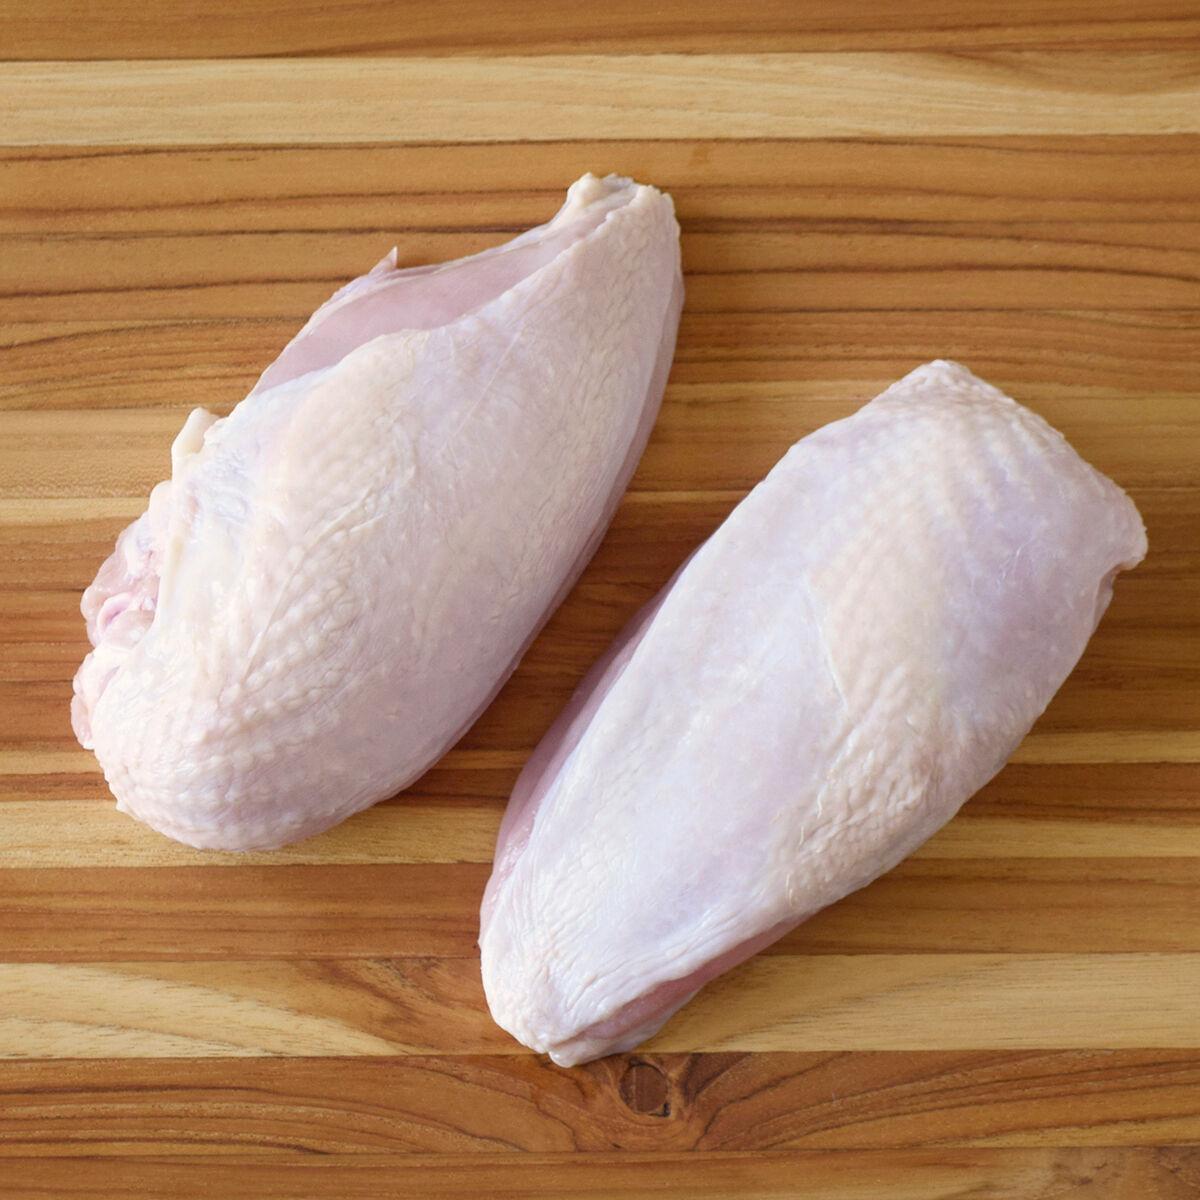 D'Artagnan Organic Chicken Breasts, Split: Fresh (5lb case 4 1.25lbs avg packs avg. each)  by D'Artagnan